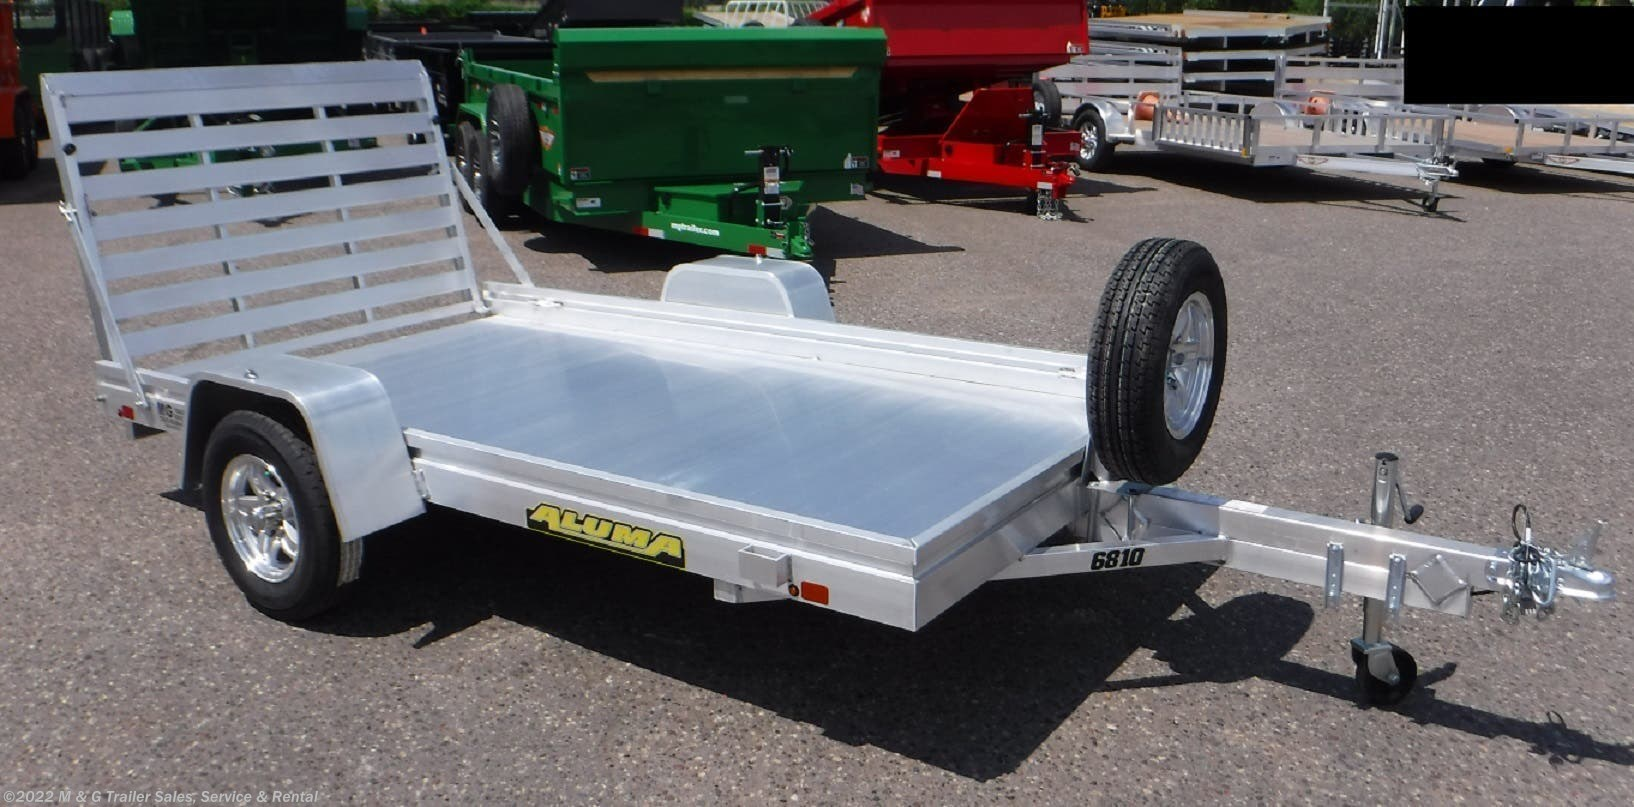 2021 Aluma 6810 Aluminum Utility Trailer - Stock #224723